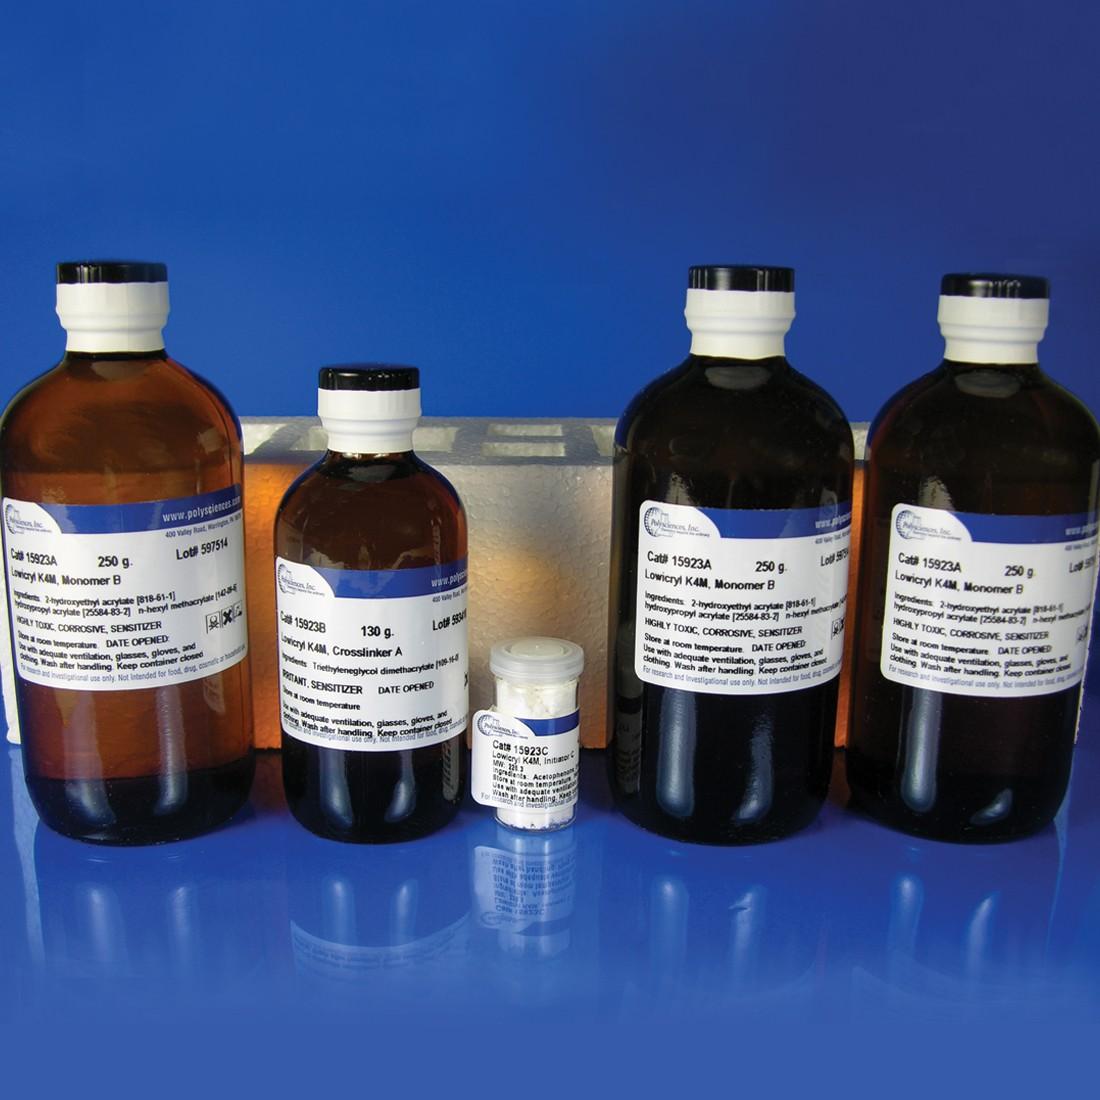 Lowicryl<sup>®</sup> K4M Polar, Hydrophilic, -35ºC embedding kit